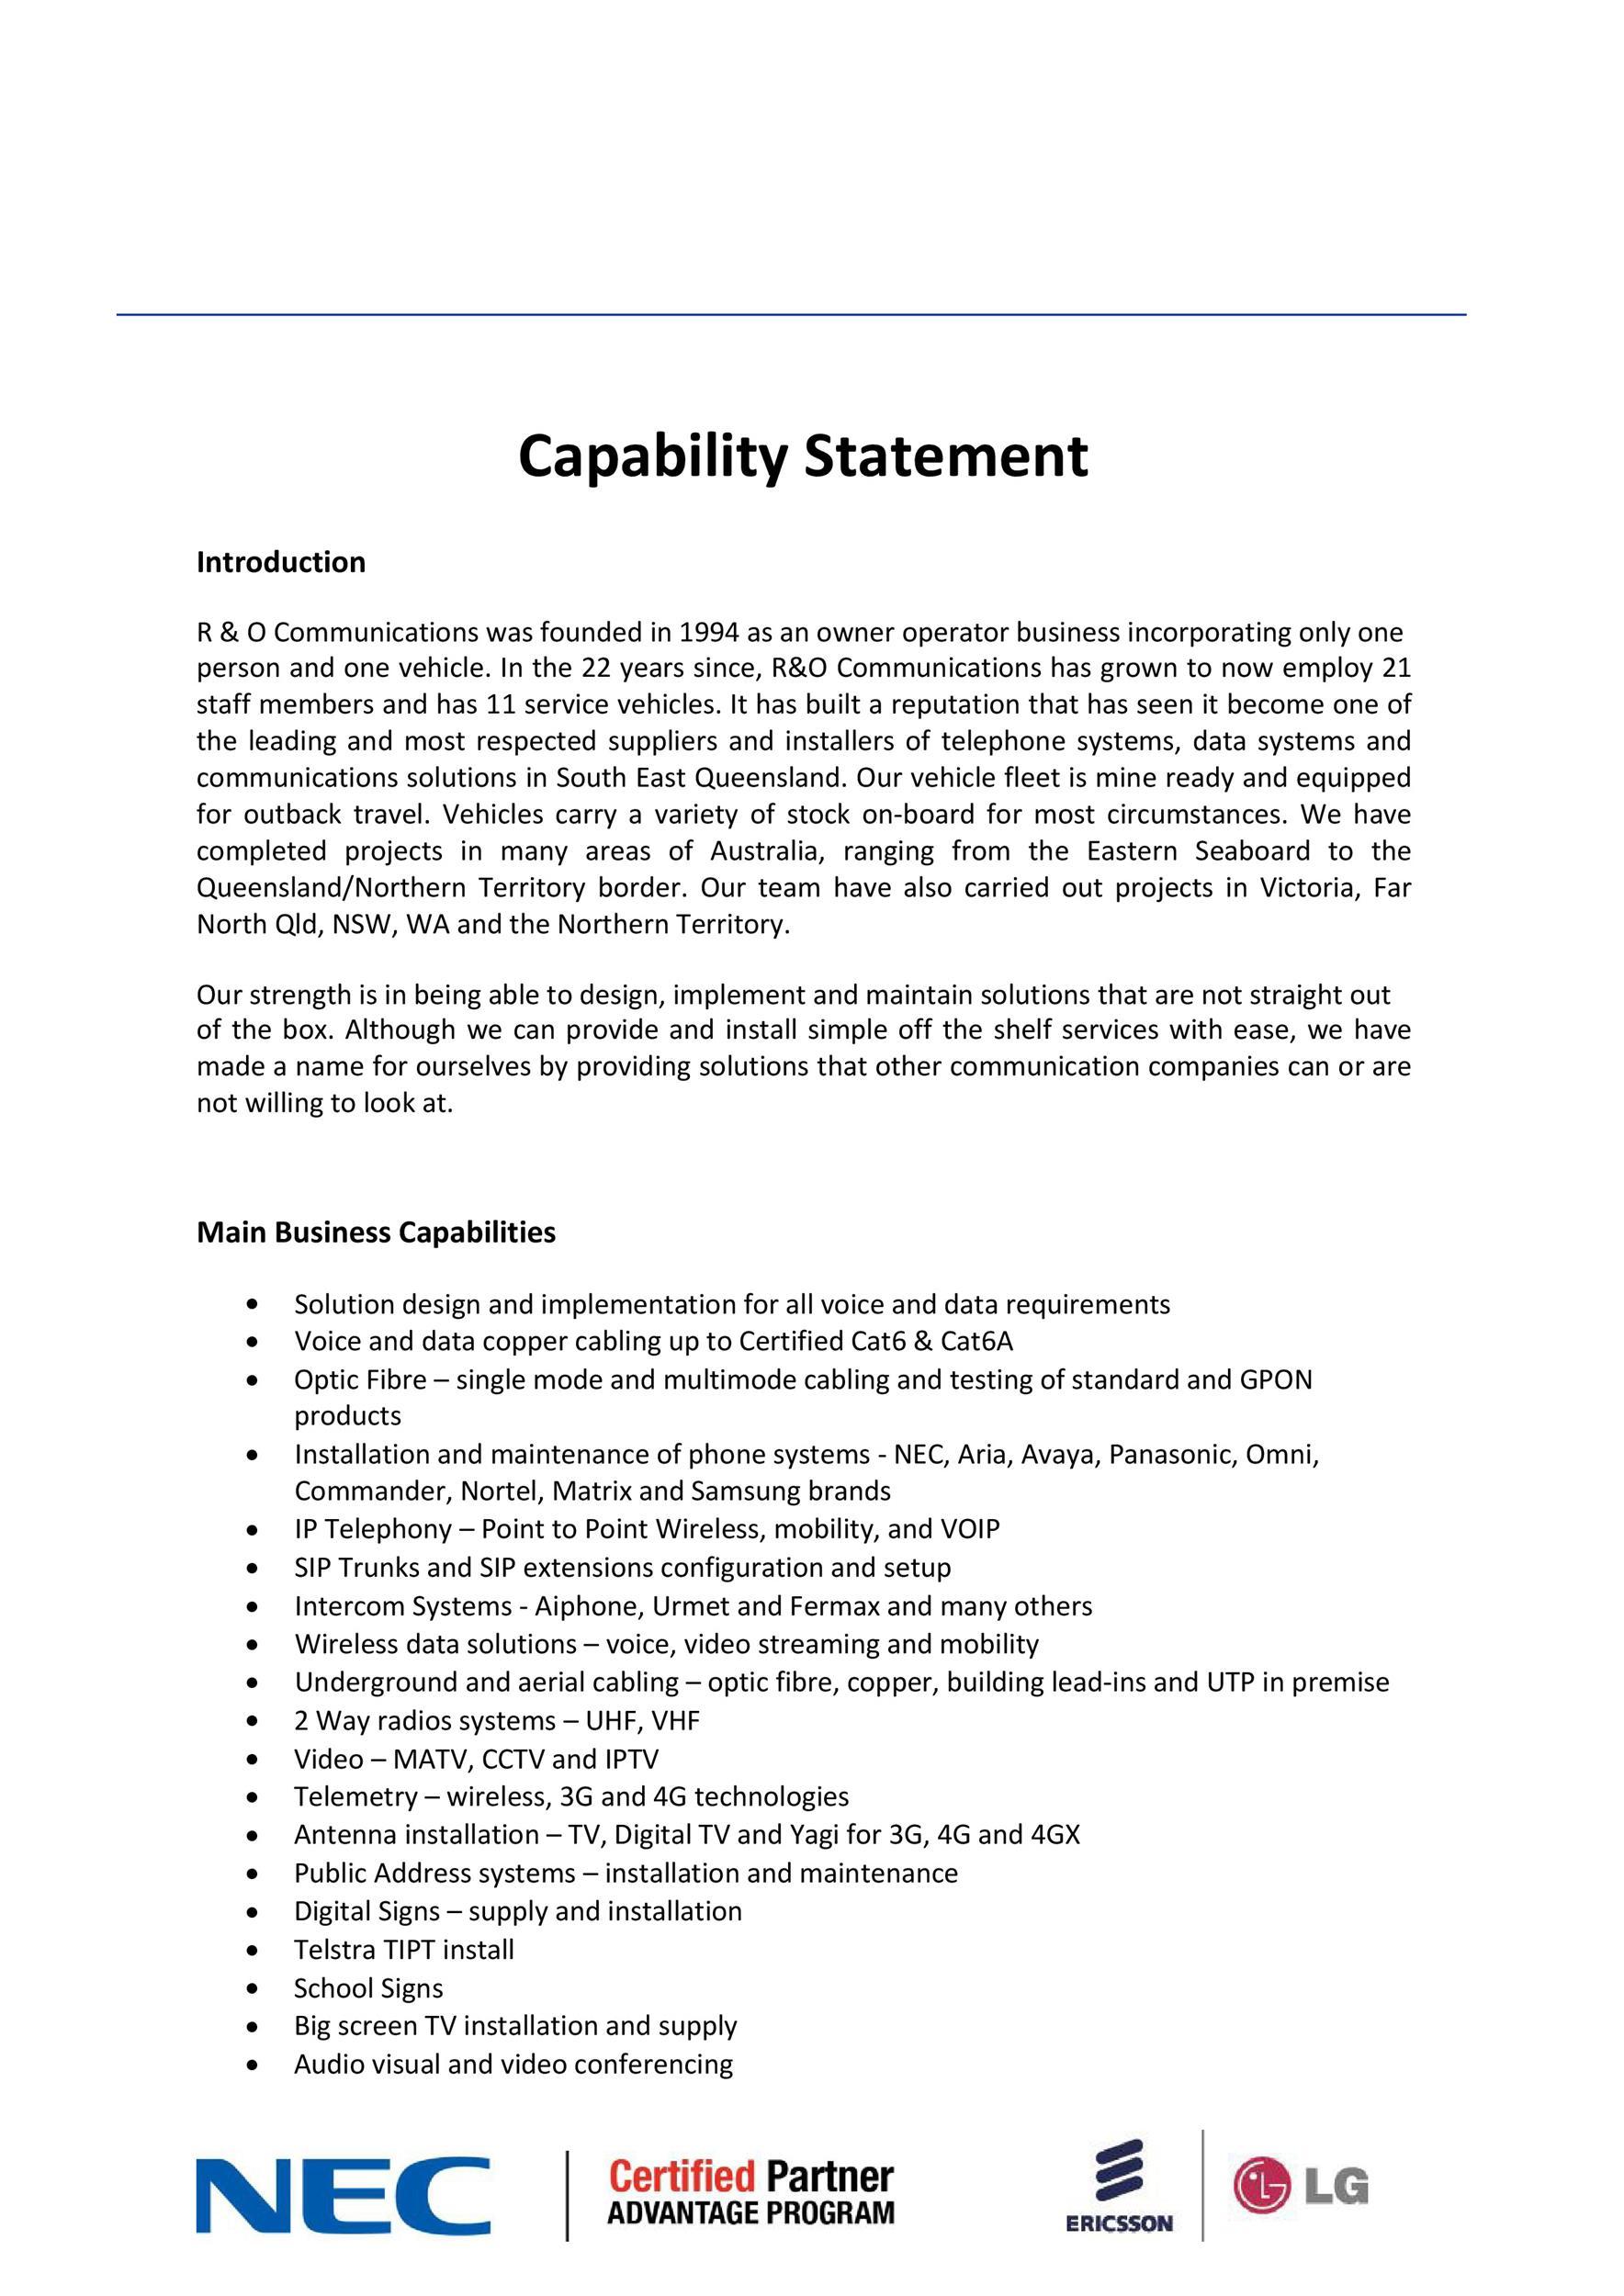 Free capability statement 32